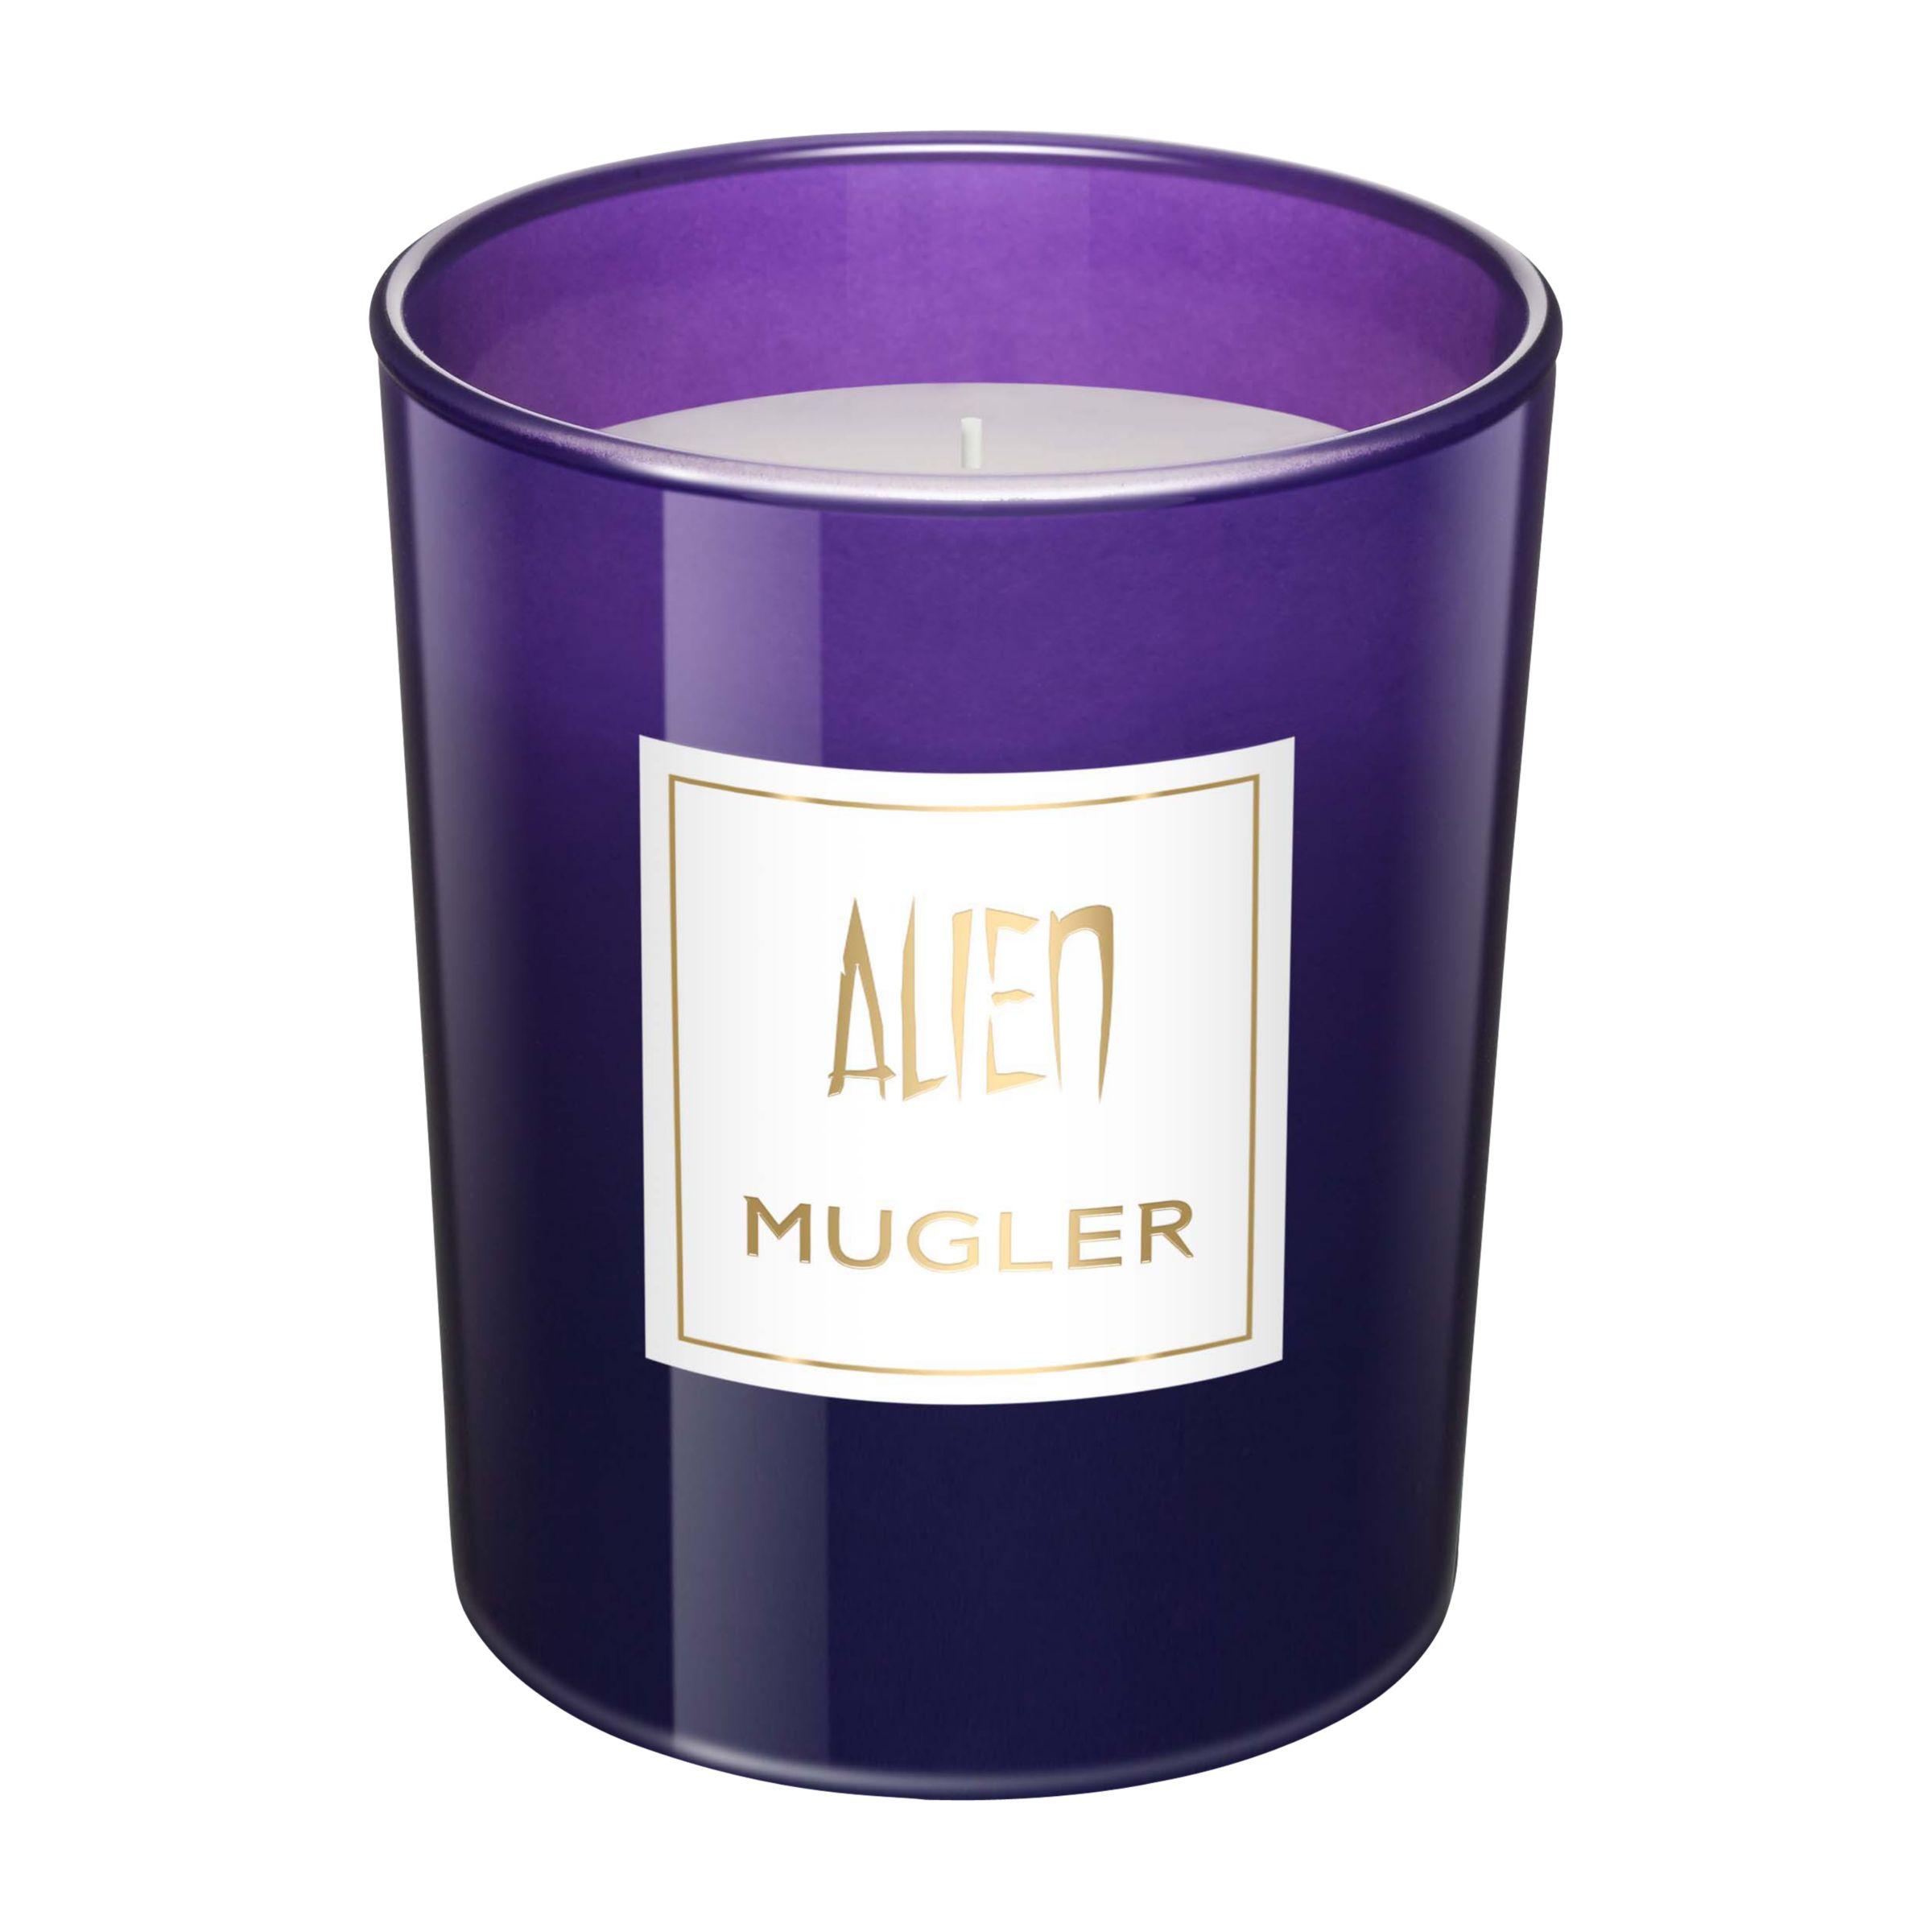 Mugler Mugler Alien Scented Candle, 180g